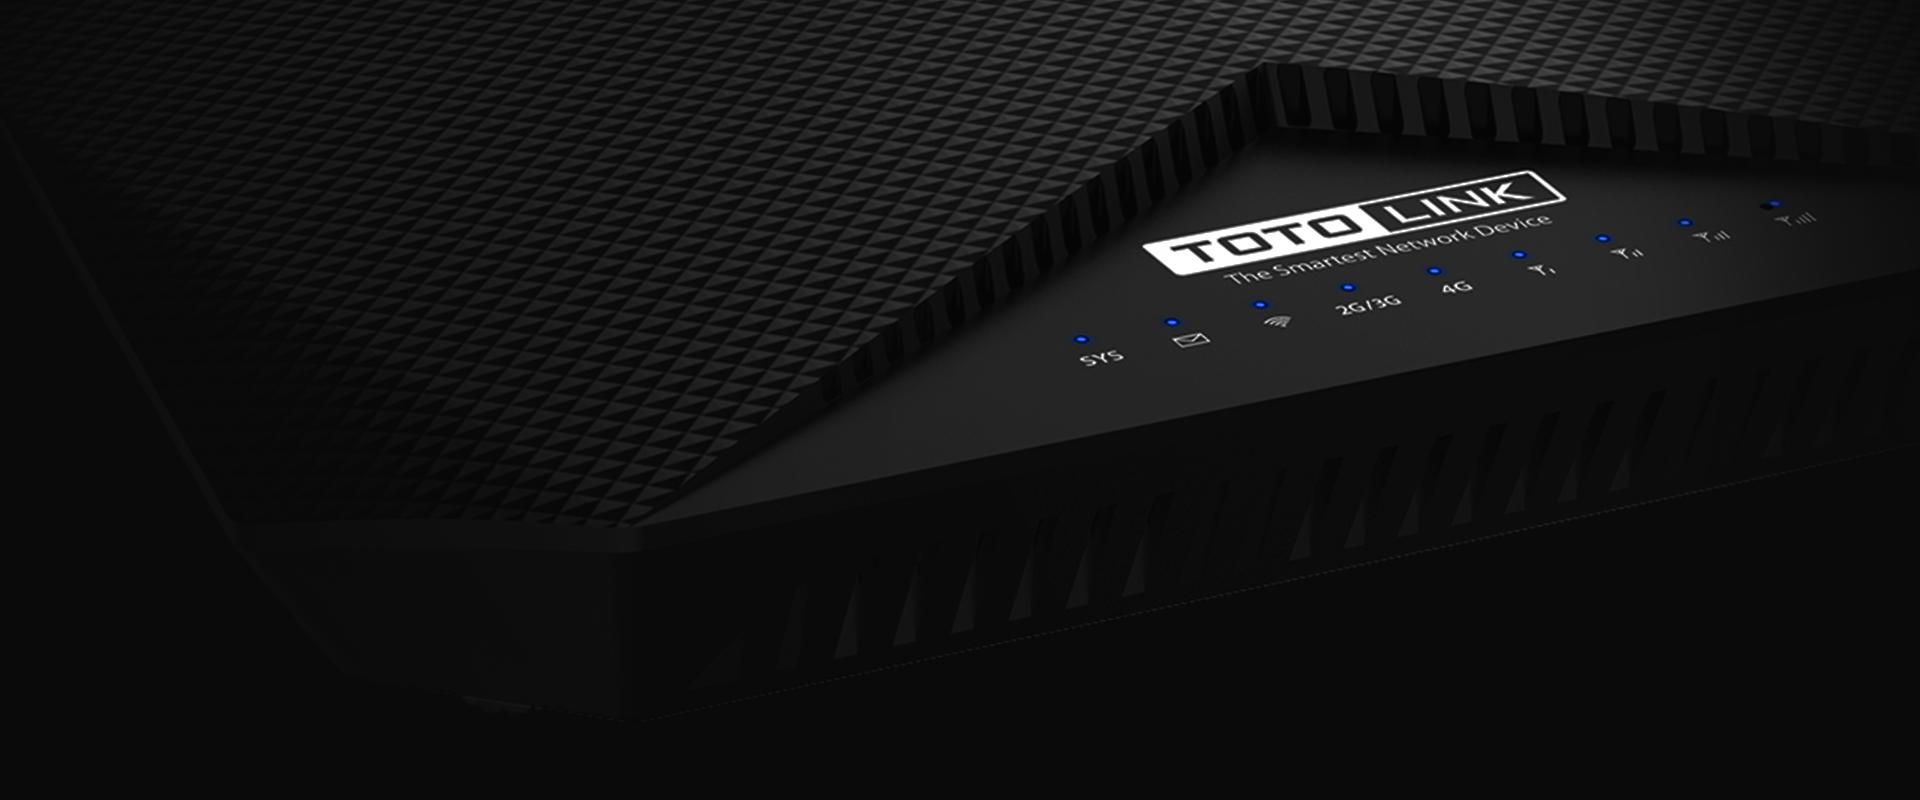 Router Bộ định tuyến 4G-LTE Totolink LR1200-7